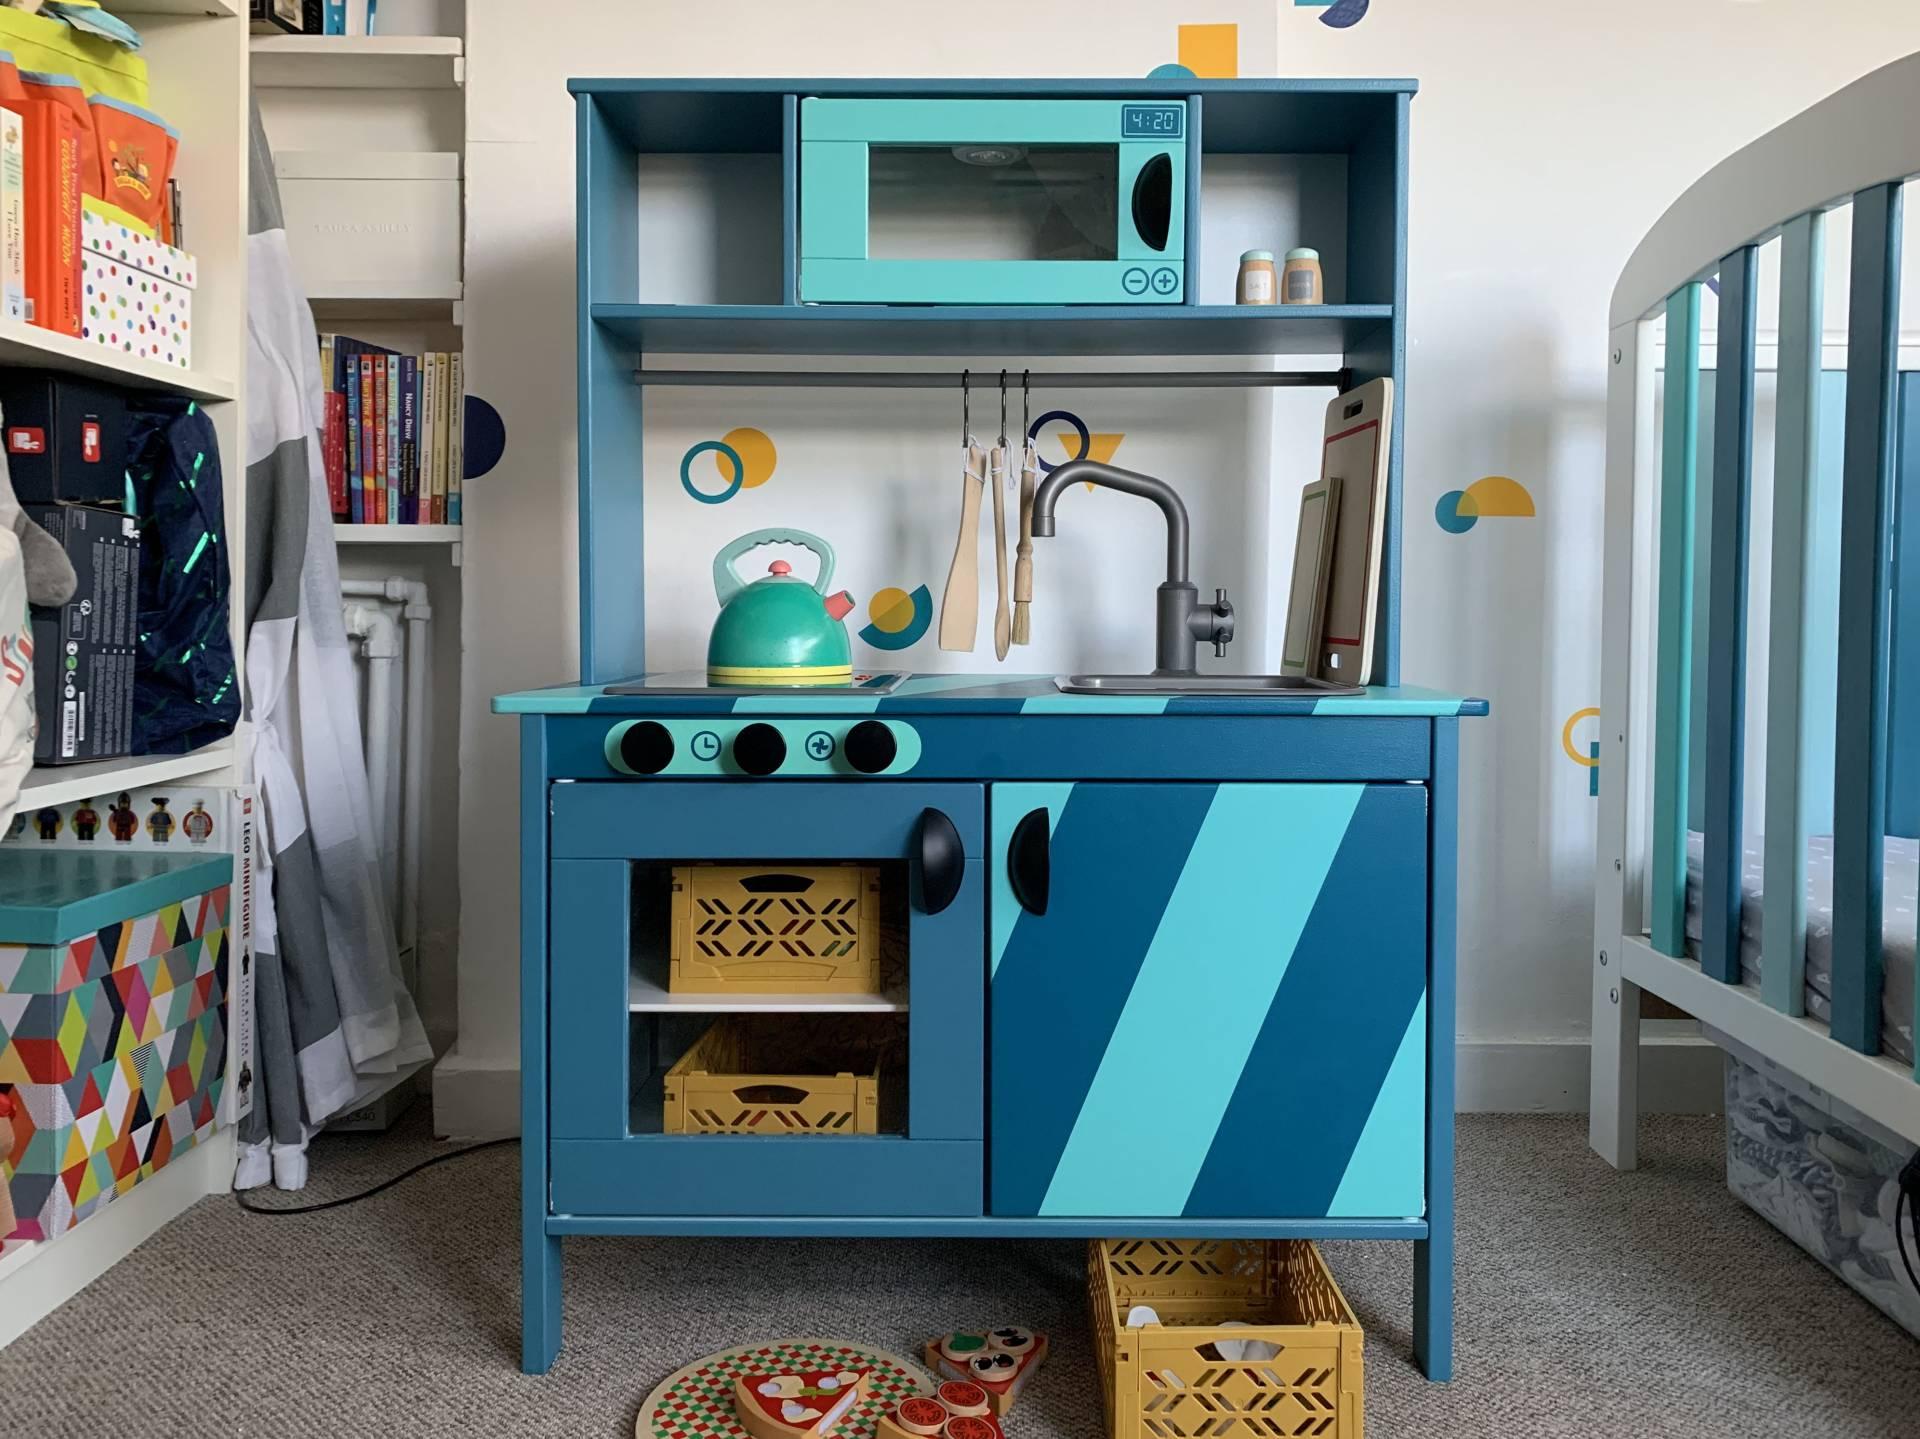 IKEA Duktig Kitchen DIY